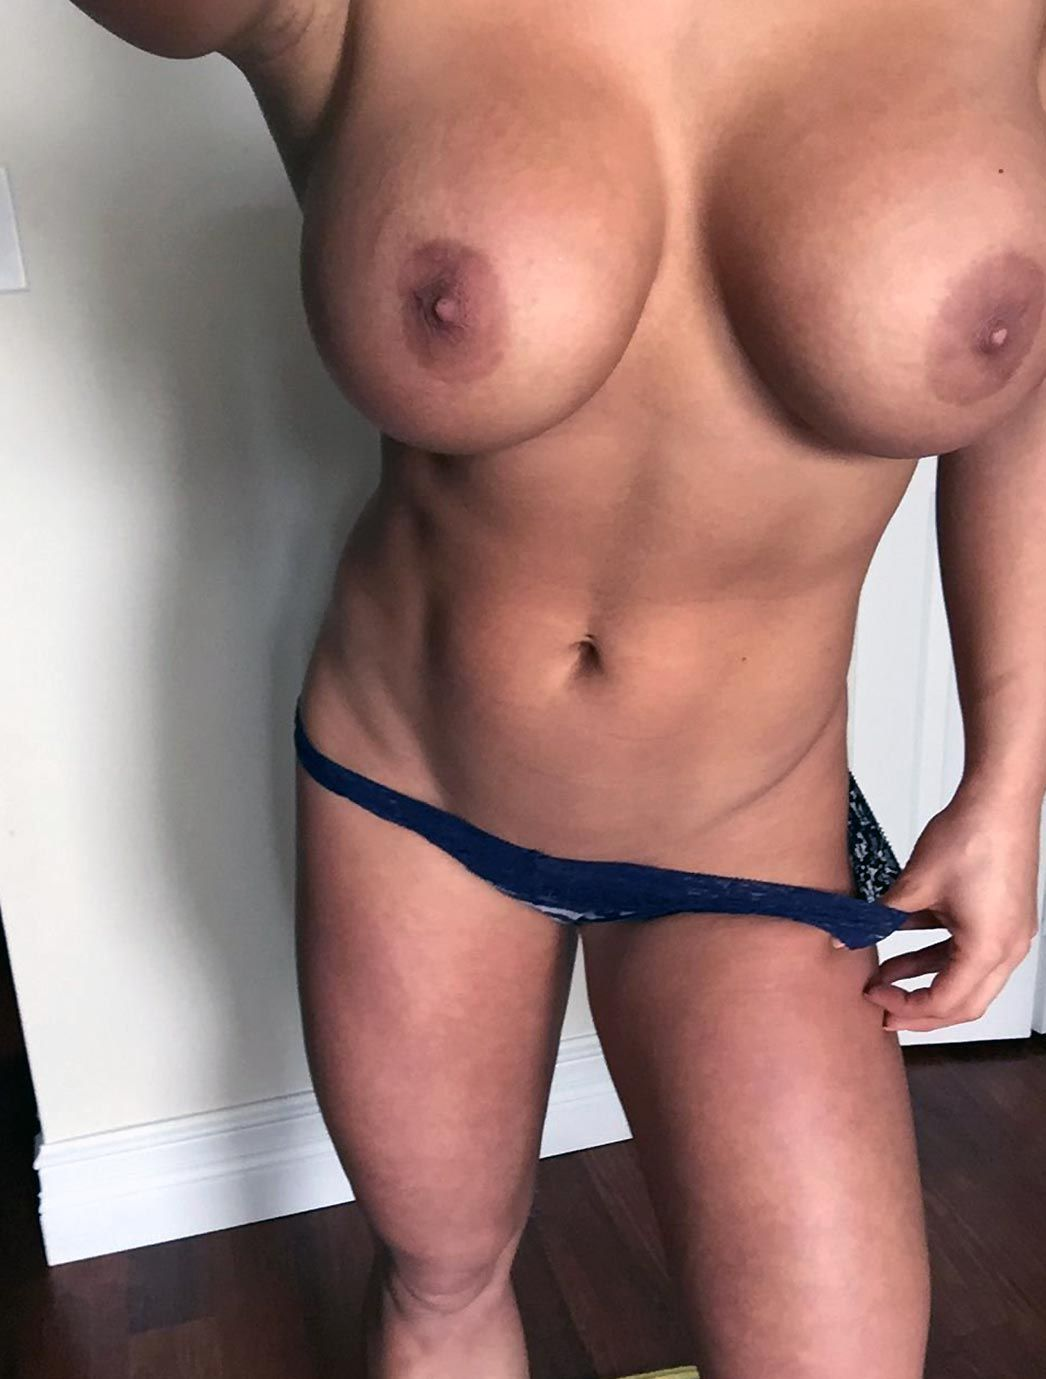 Celeste Bonin Nude Leaked The Fappening & Sexy 0290